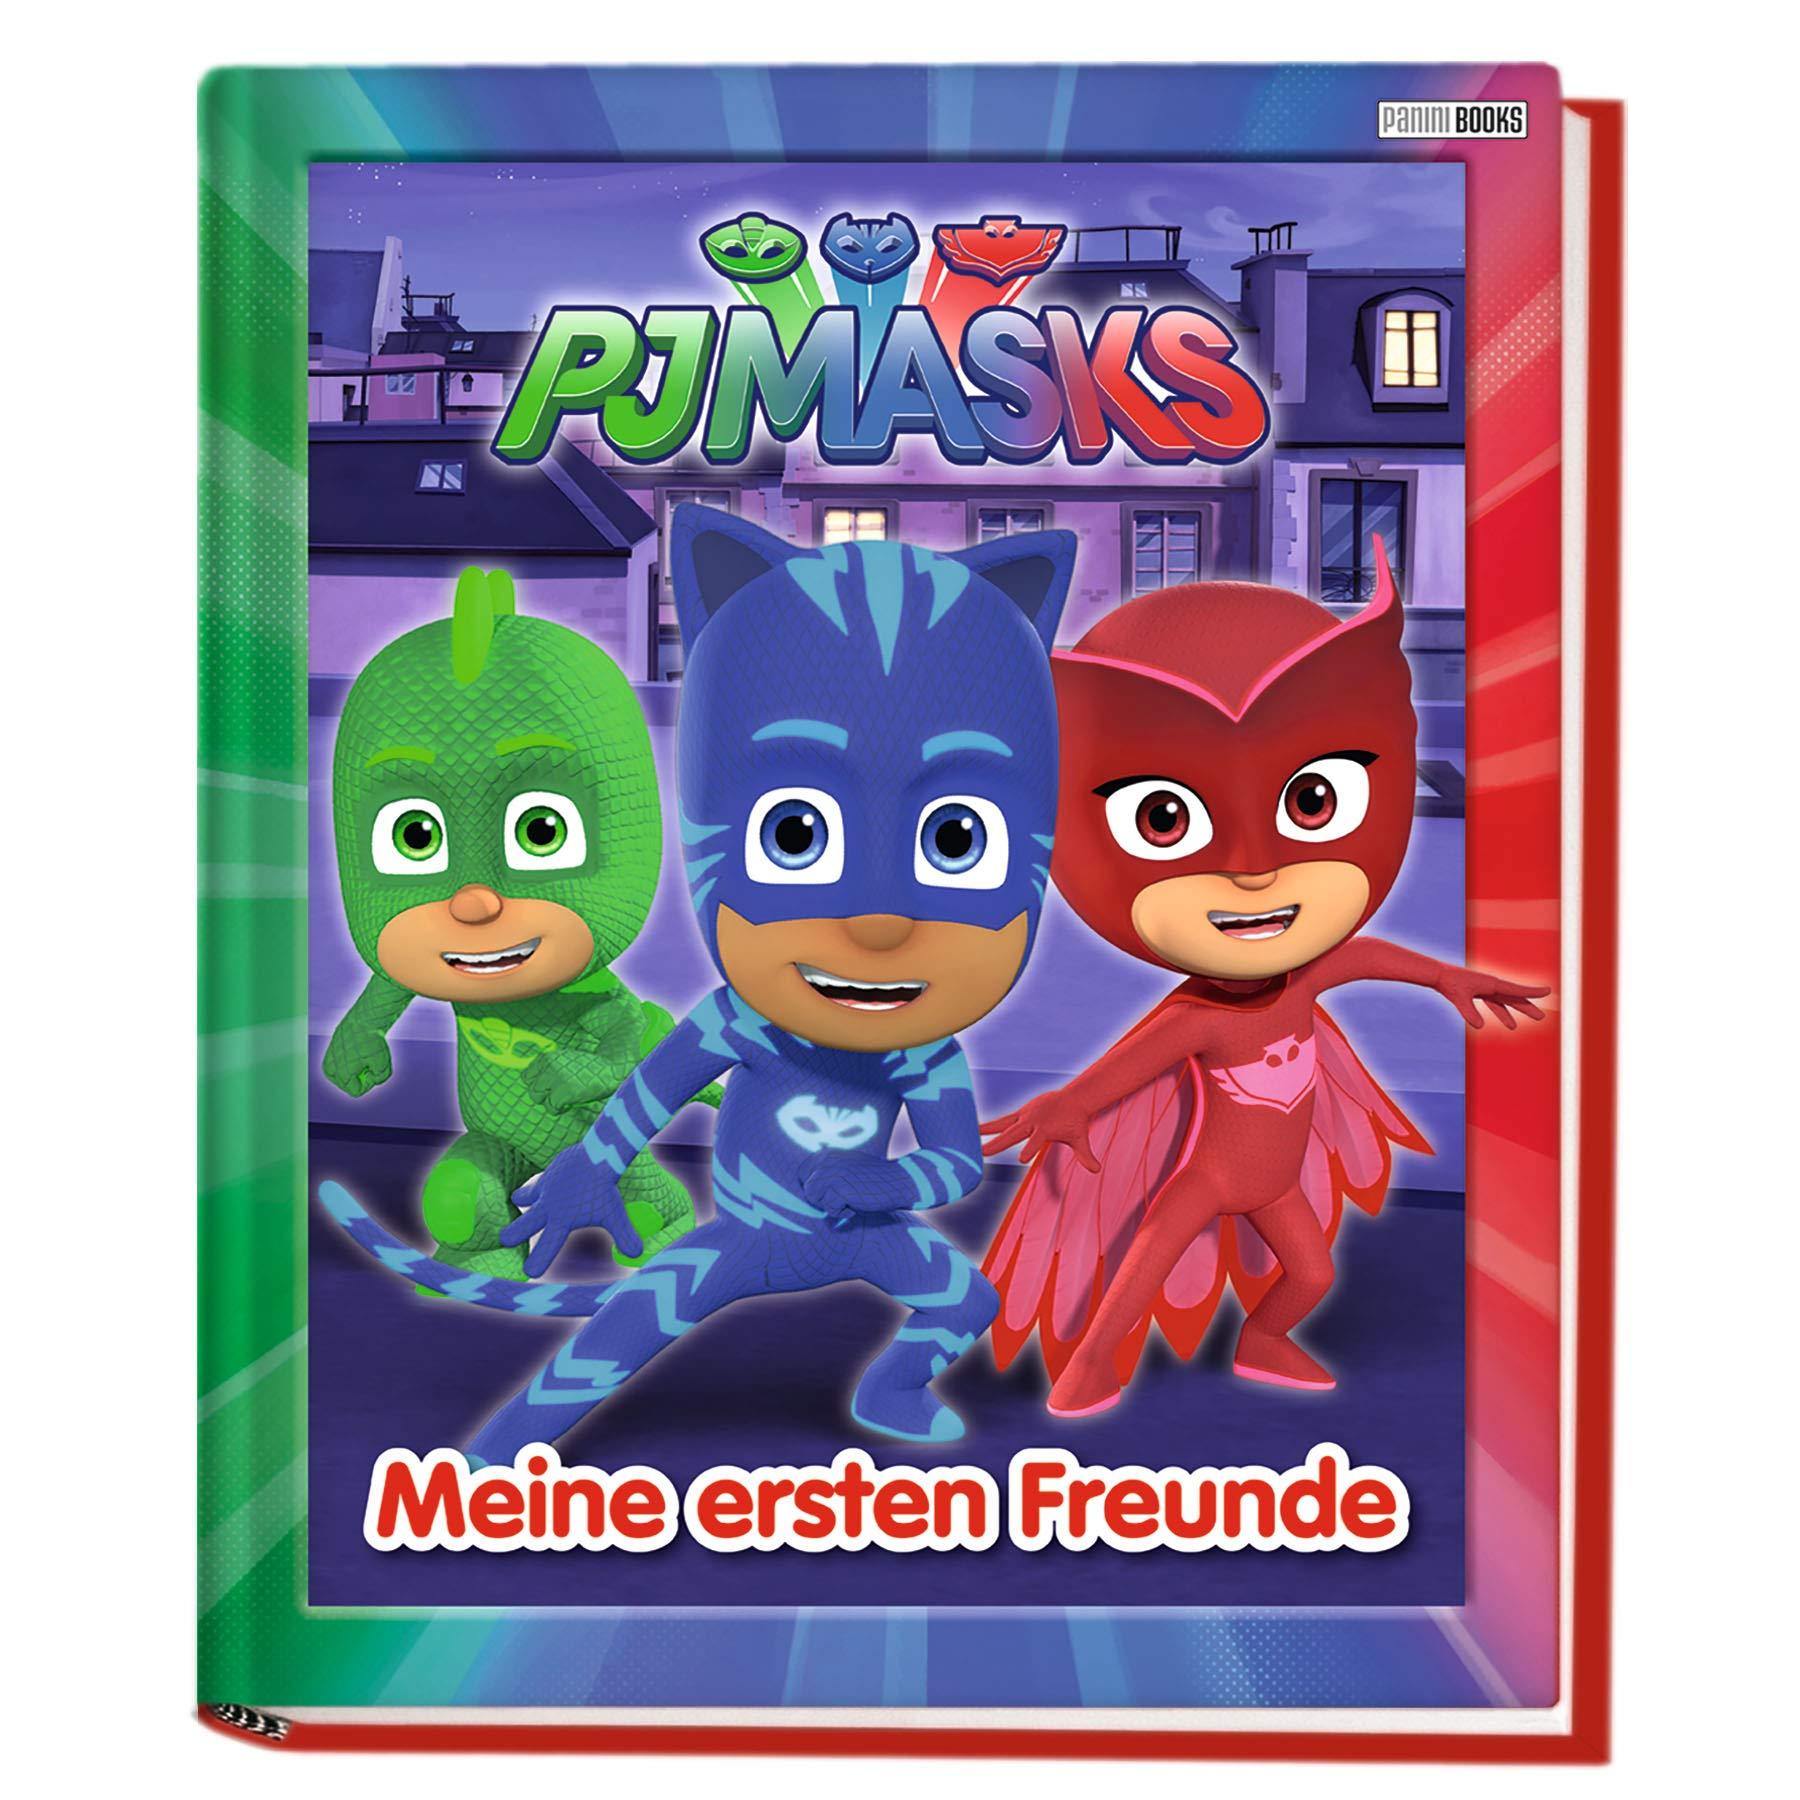 PJ Masks: Meine ersten Freunde: PJMASKS : Amazon.es: Libros